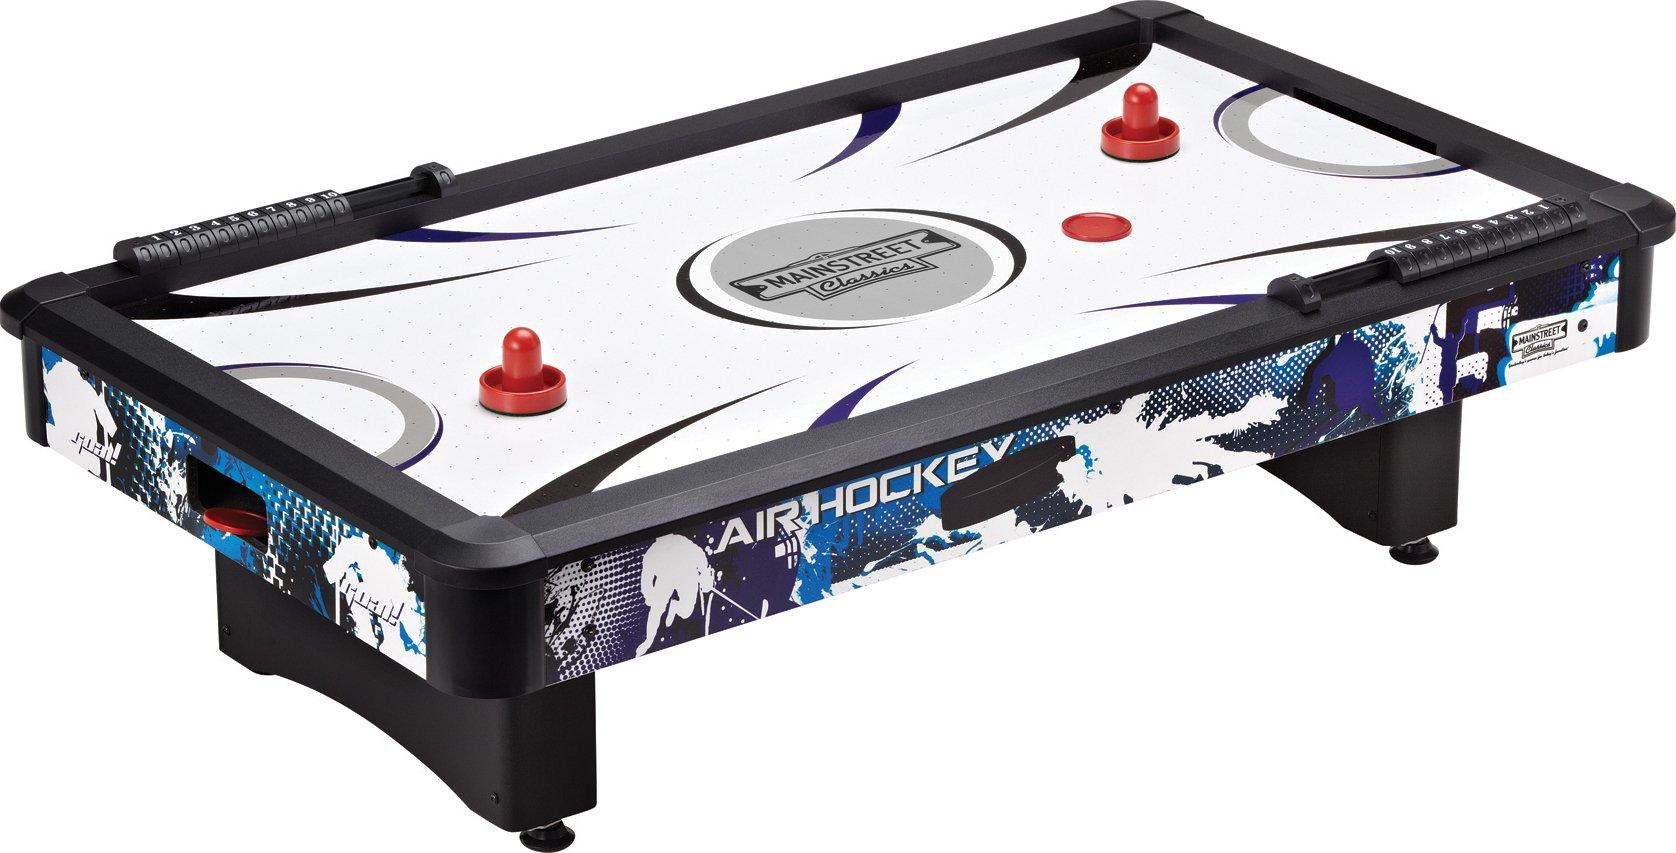 Mainstreet Classics 42-Inch Table Top Air Hockey Game by Mainstreet Classics by GLD Products